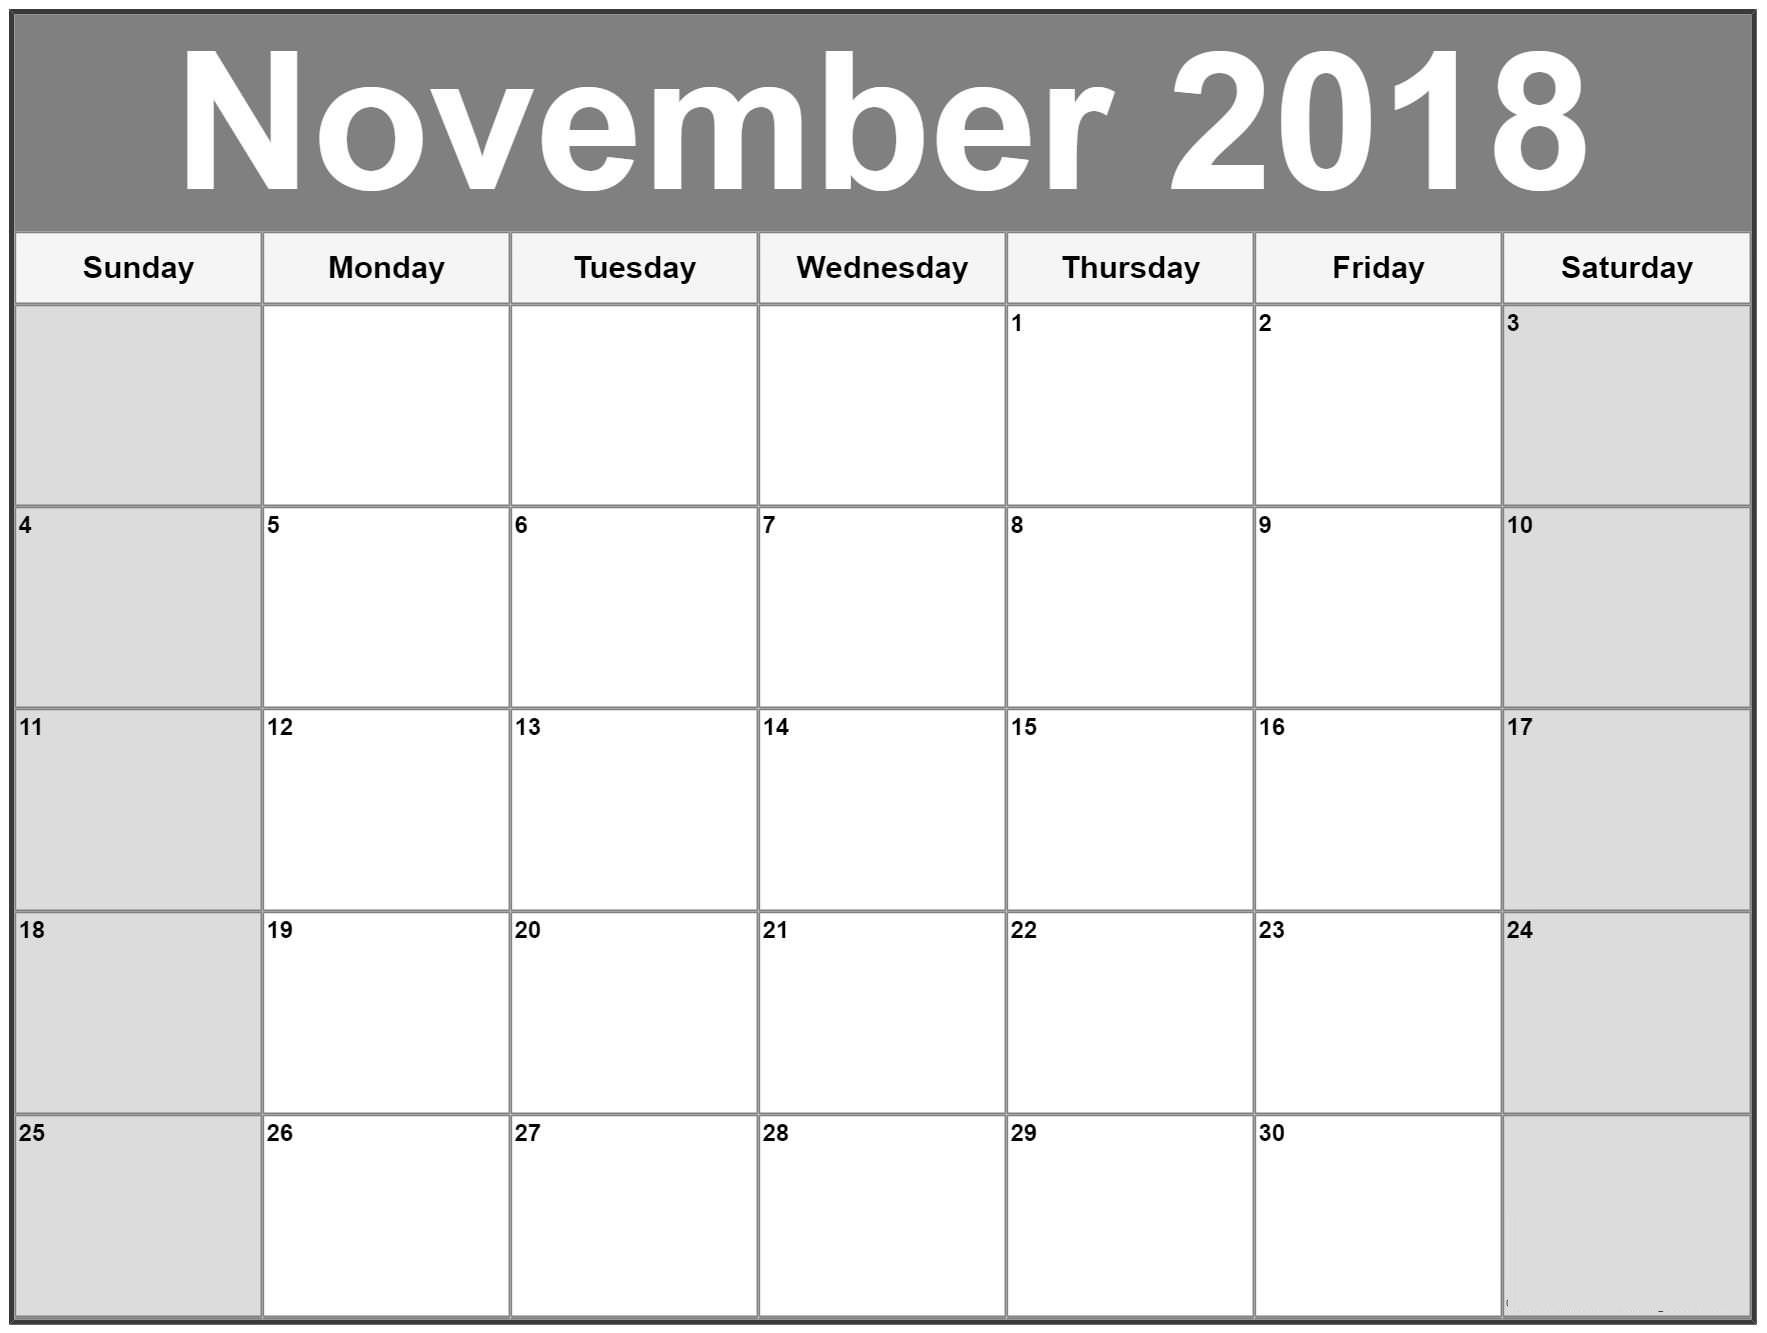 November 2018 Calendar Printable Templates Blank Excel Pdf Free